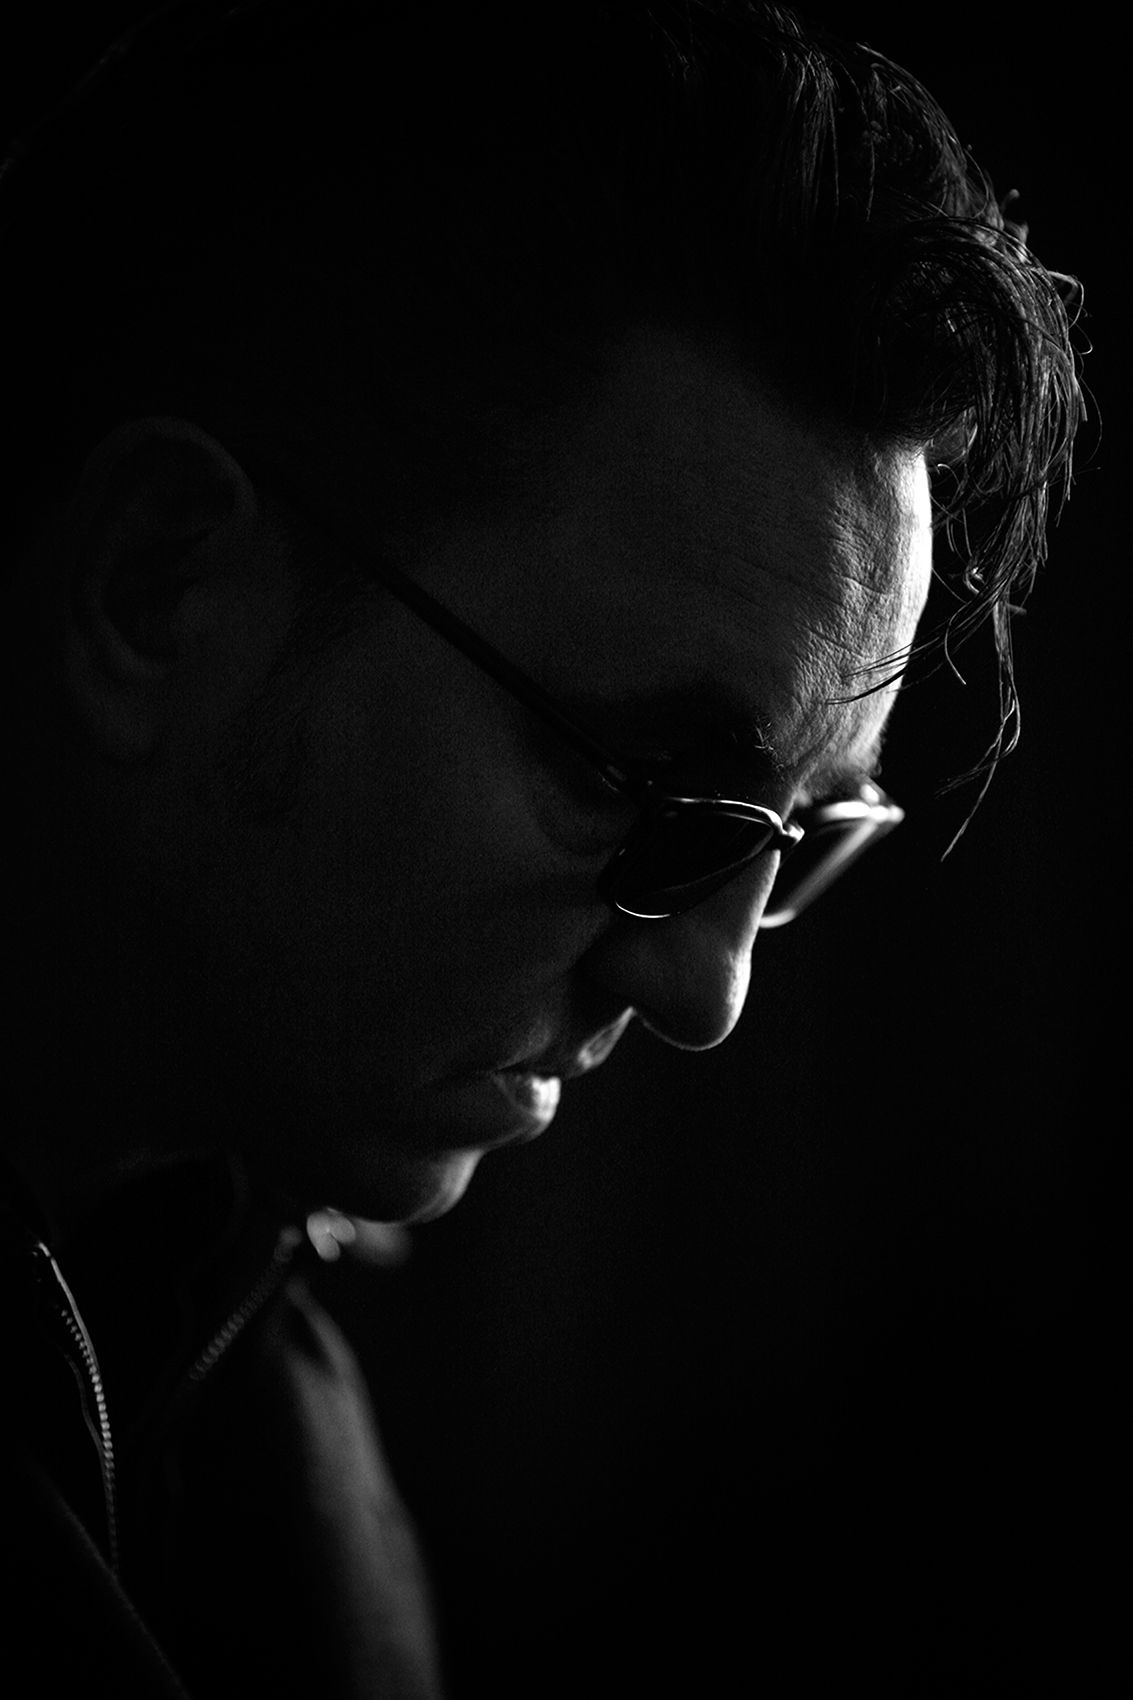 Musician Richard Hawley